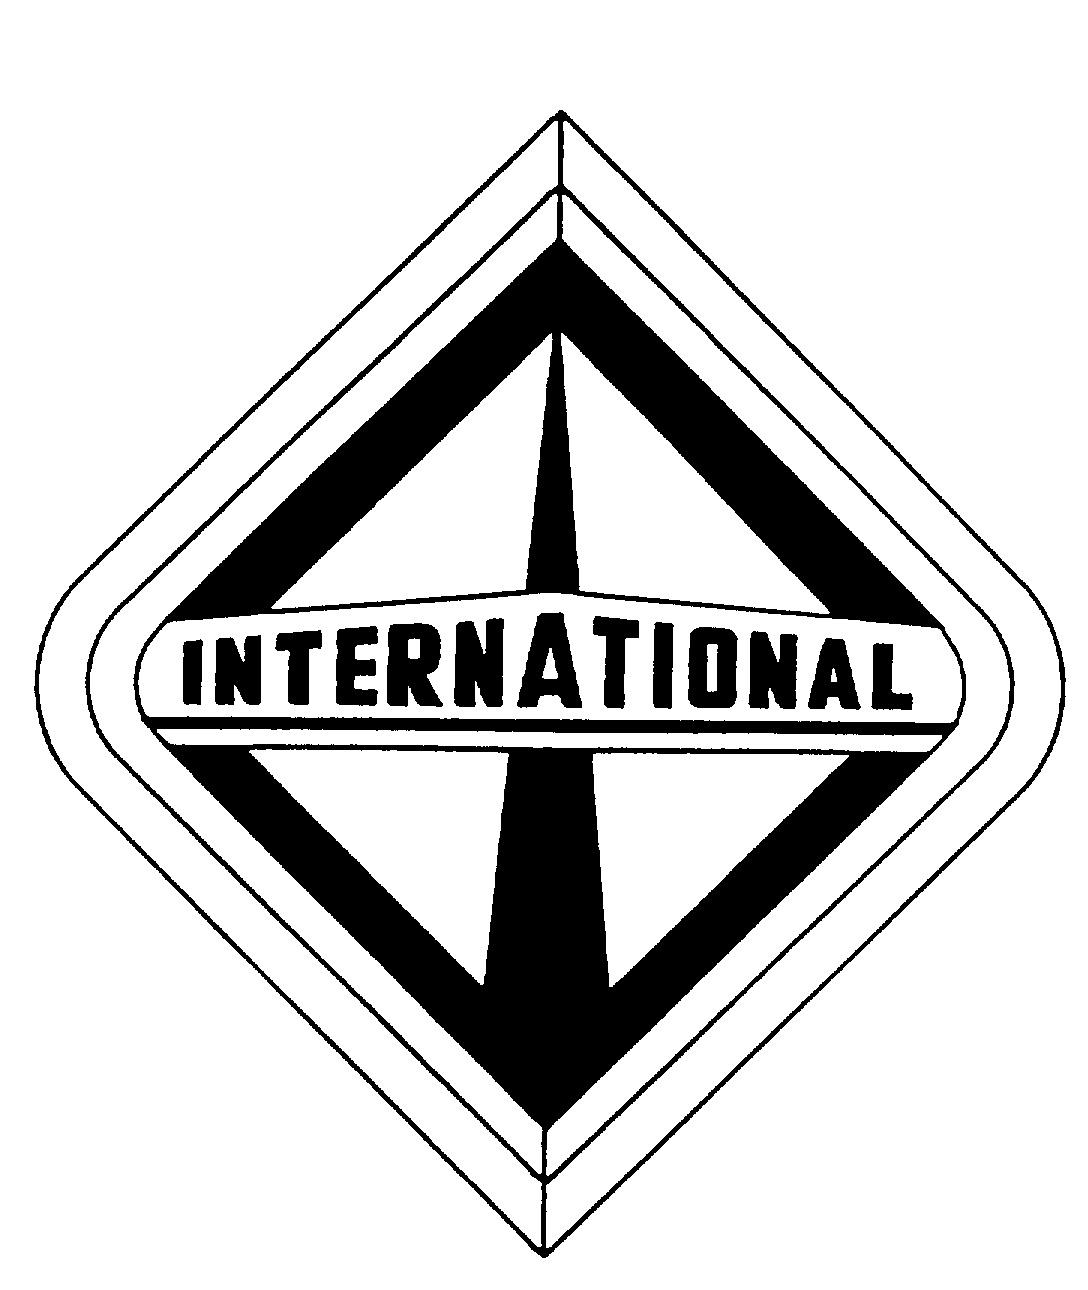 The International Logos